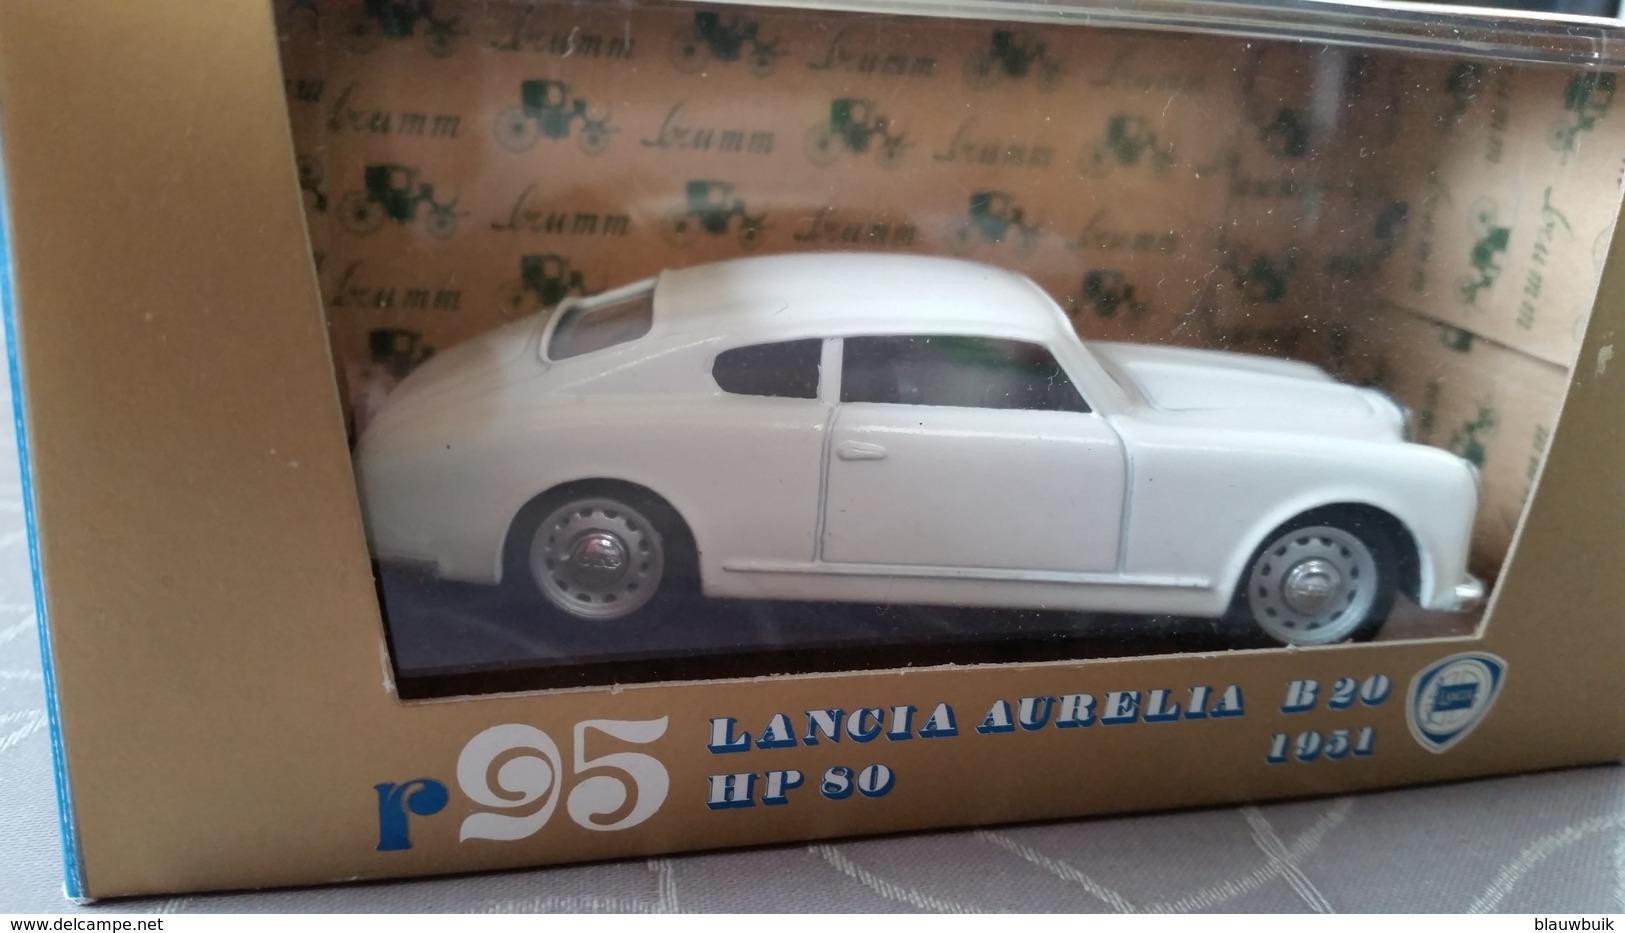 1/43 Brumm (Italy) Lancia Aurelia B20 HP80 1951 #95 Wit - Brumm